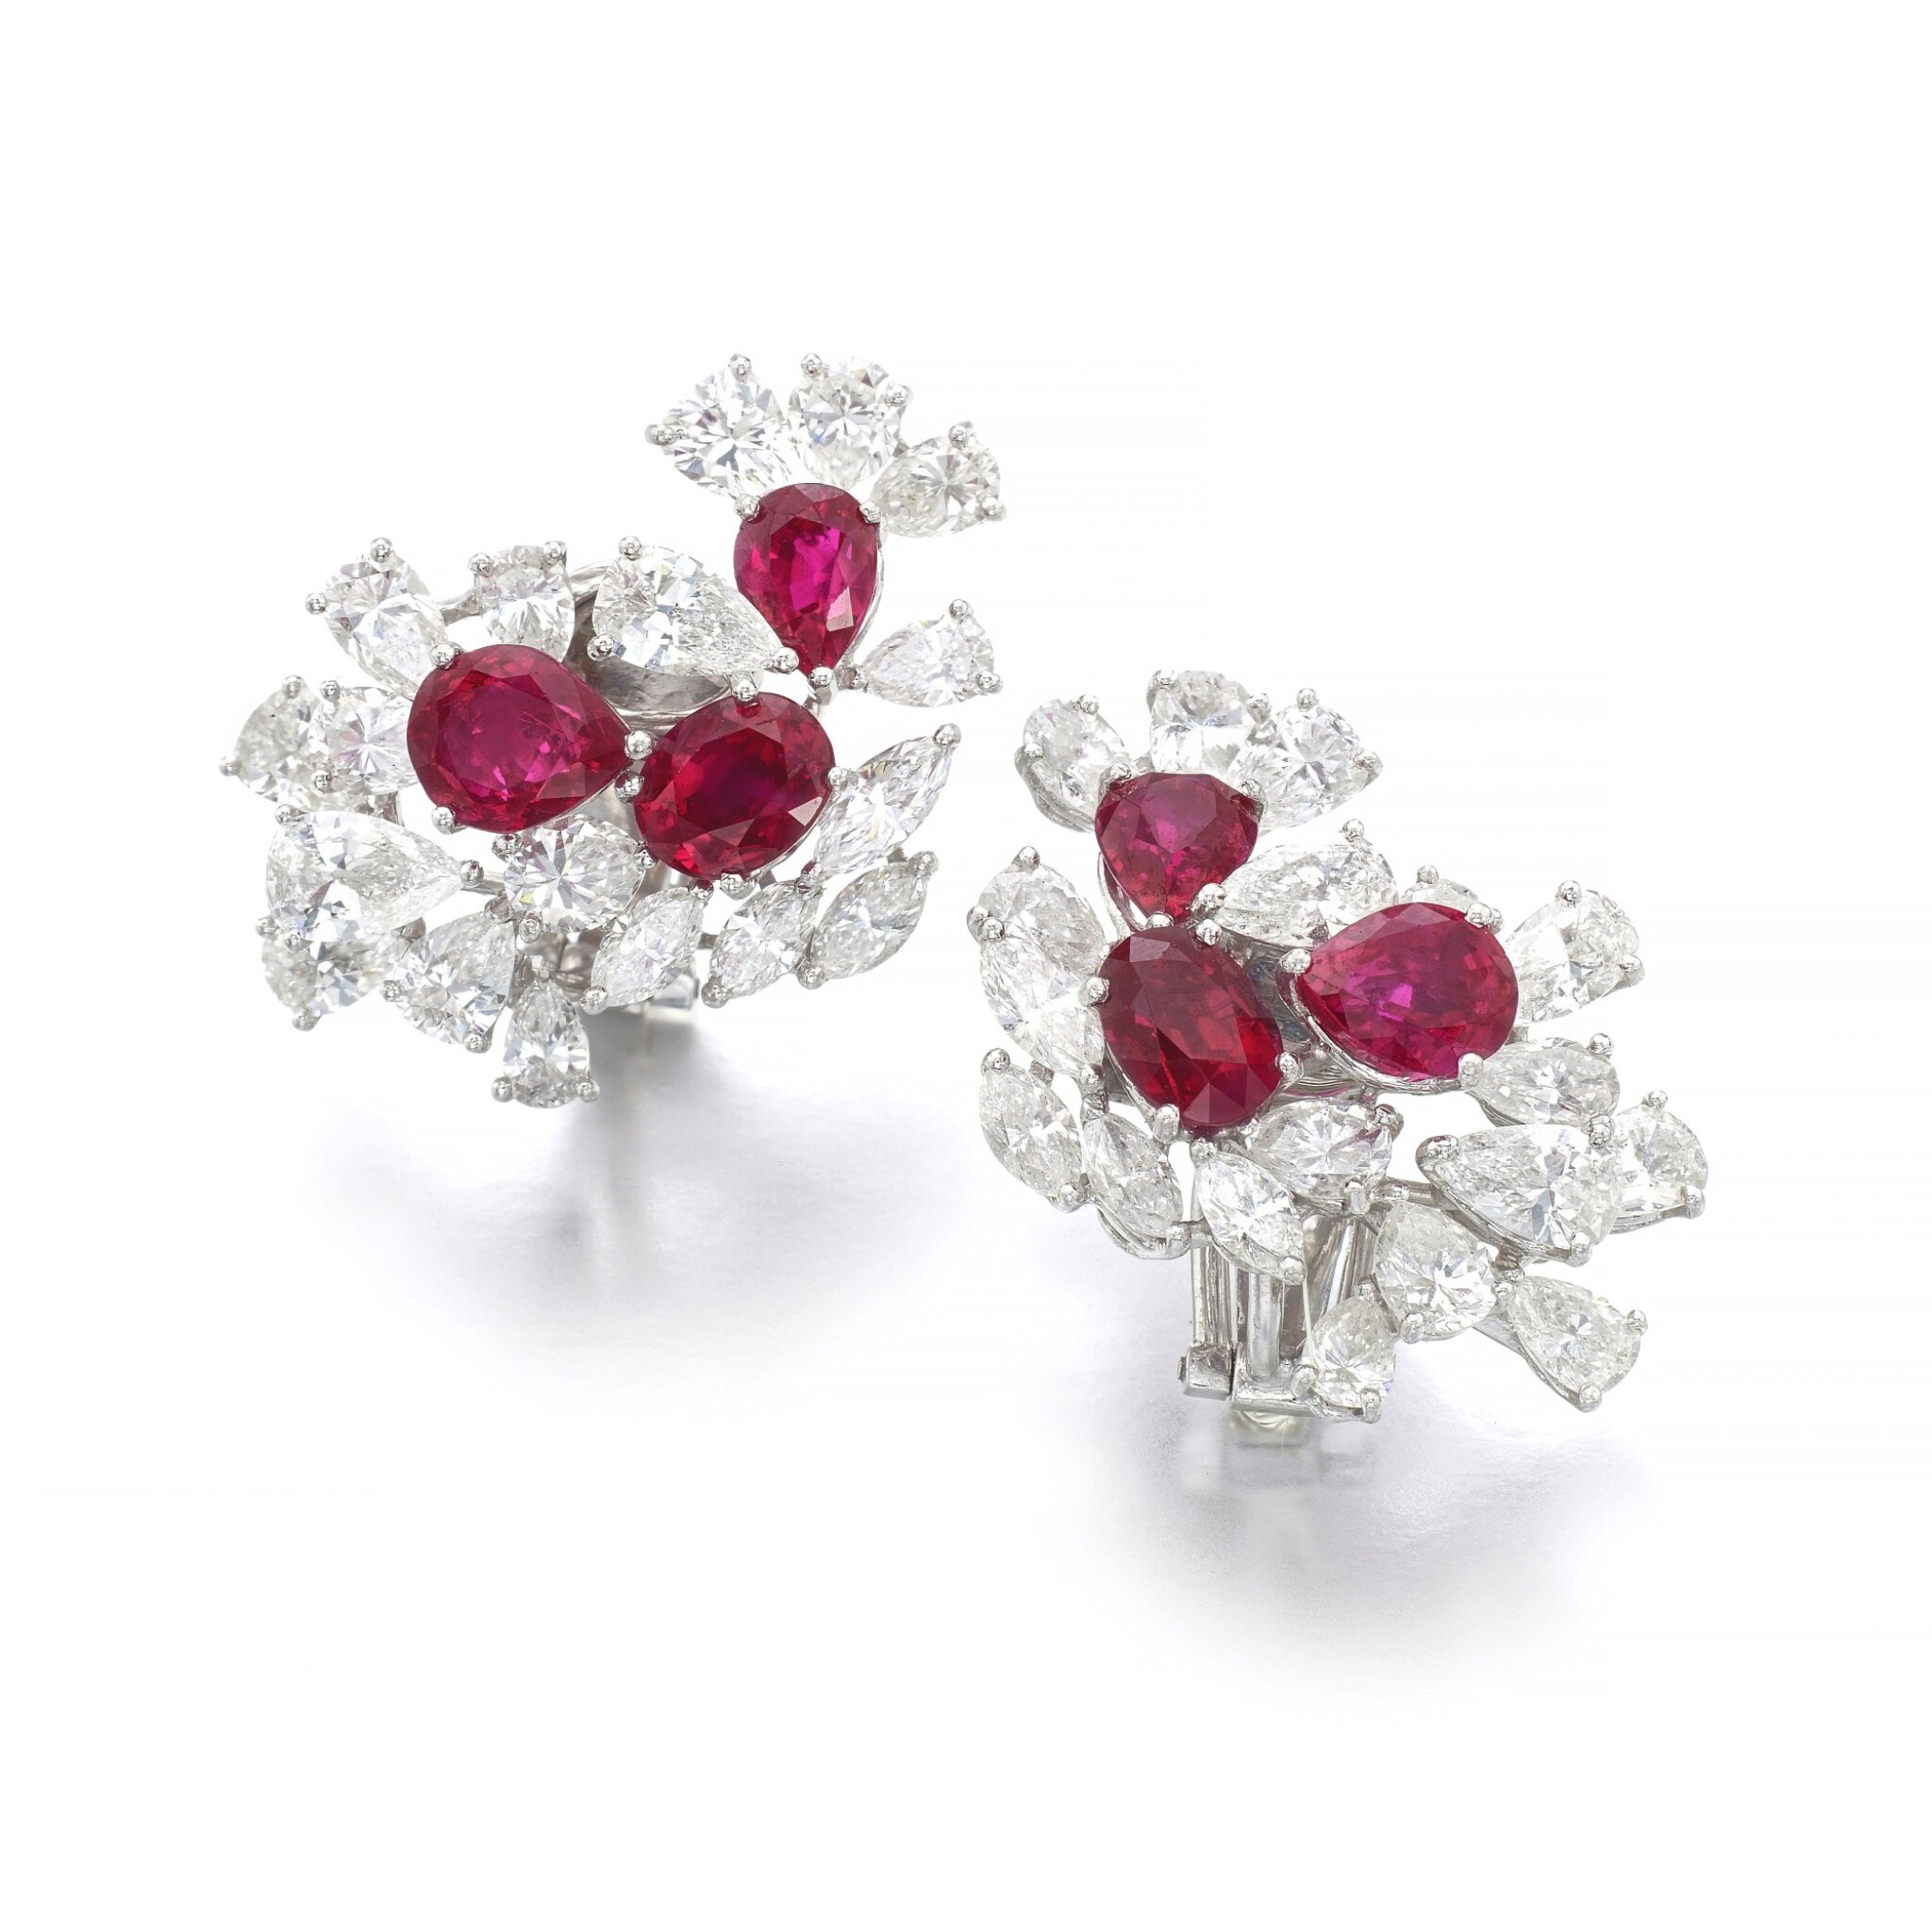 Ruby and diamond ear clips